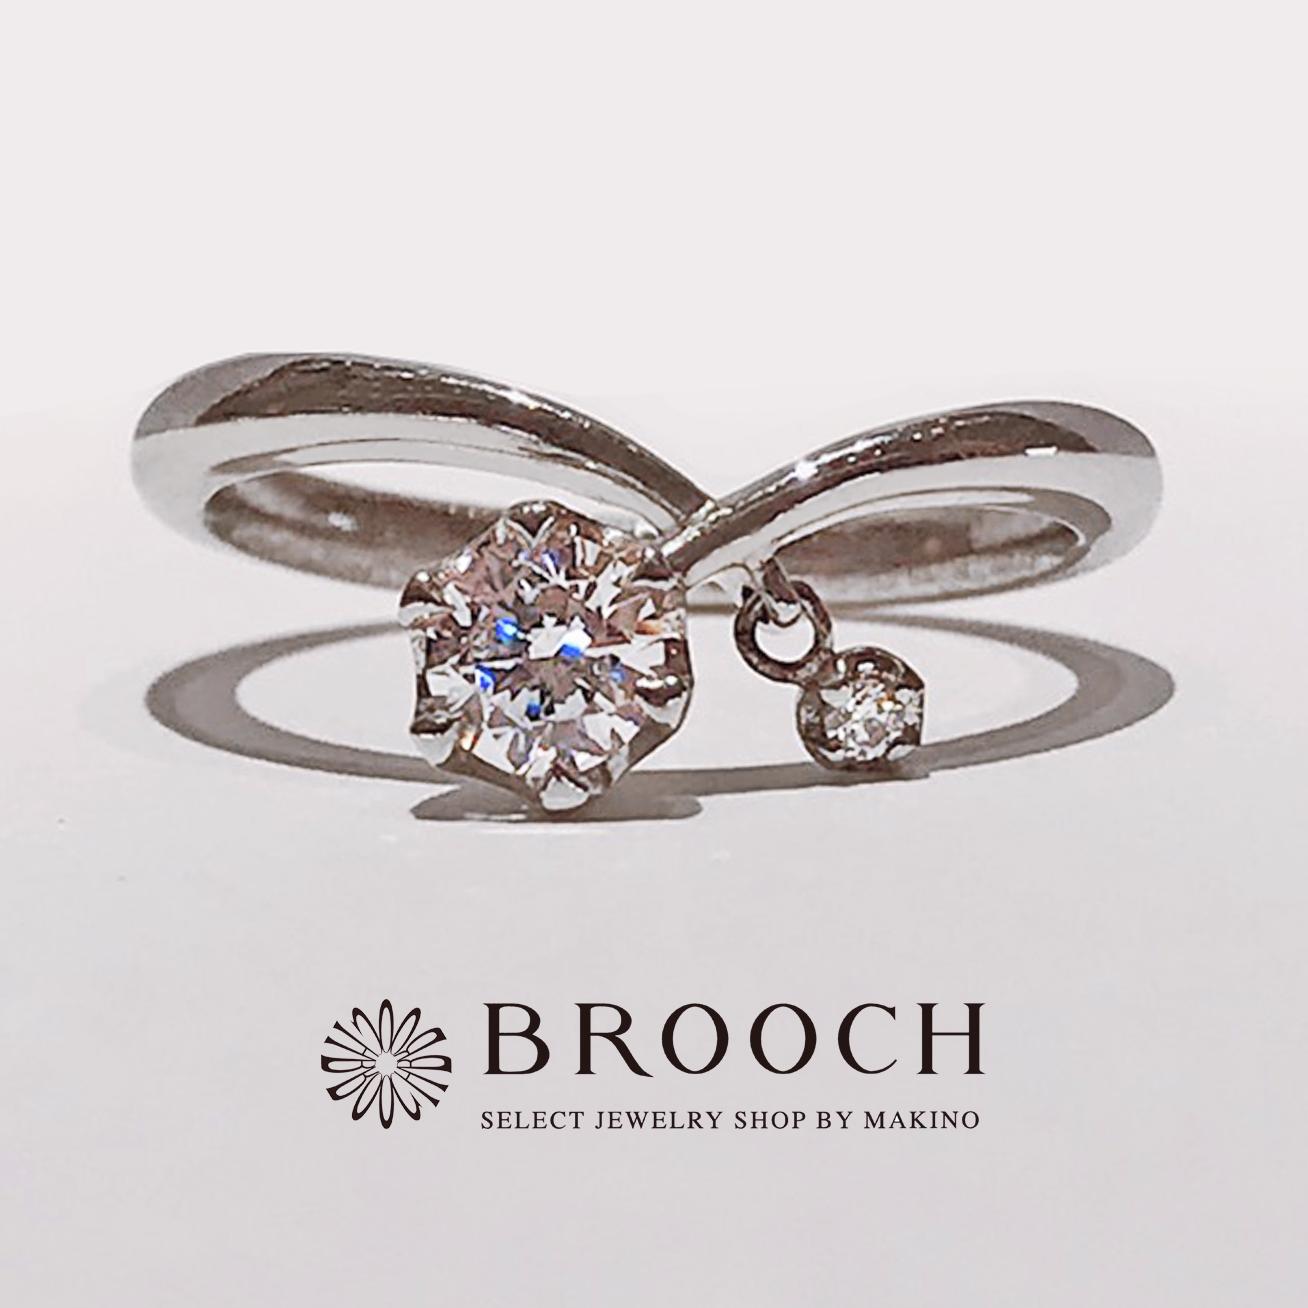 BROOCH 婚約指輪 エンゲージリング 個性派Ⅴ字デザイン